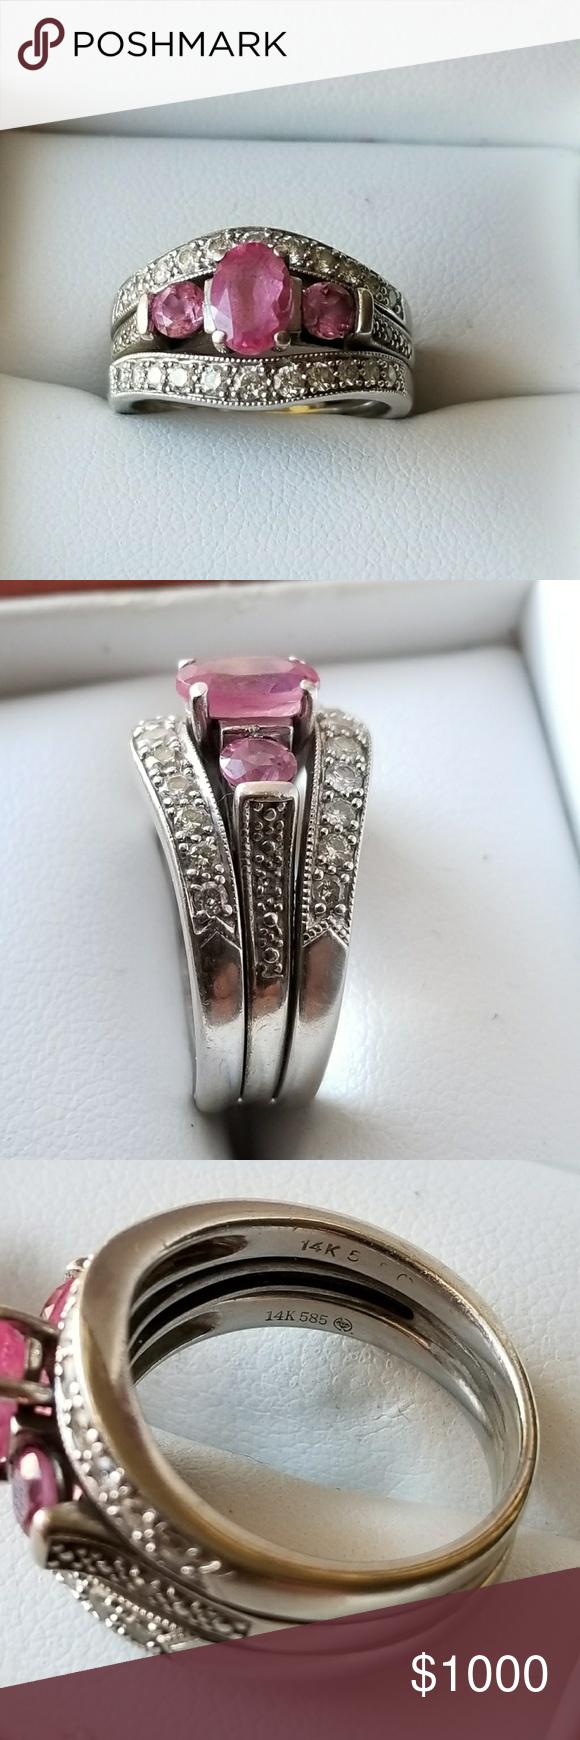 Women's wedding ring set Selling a very beautiful wedding